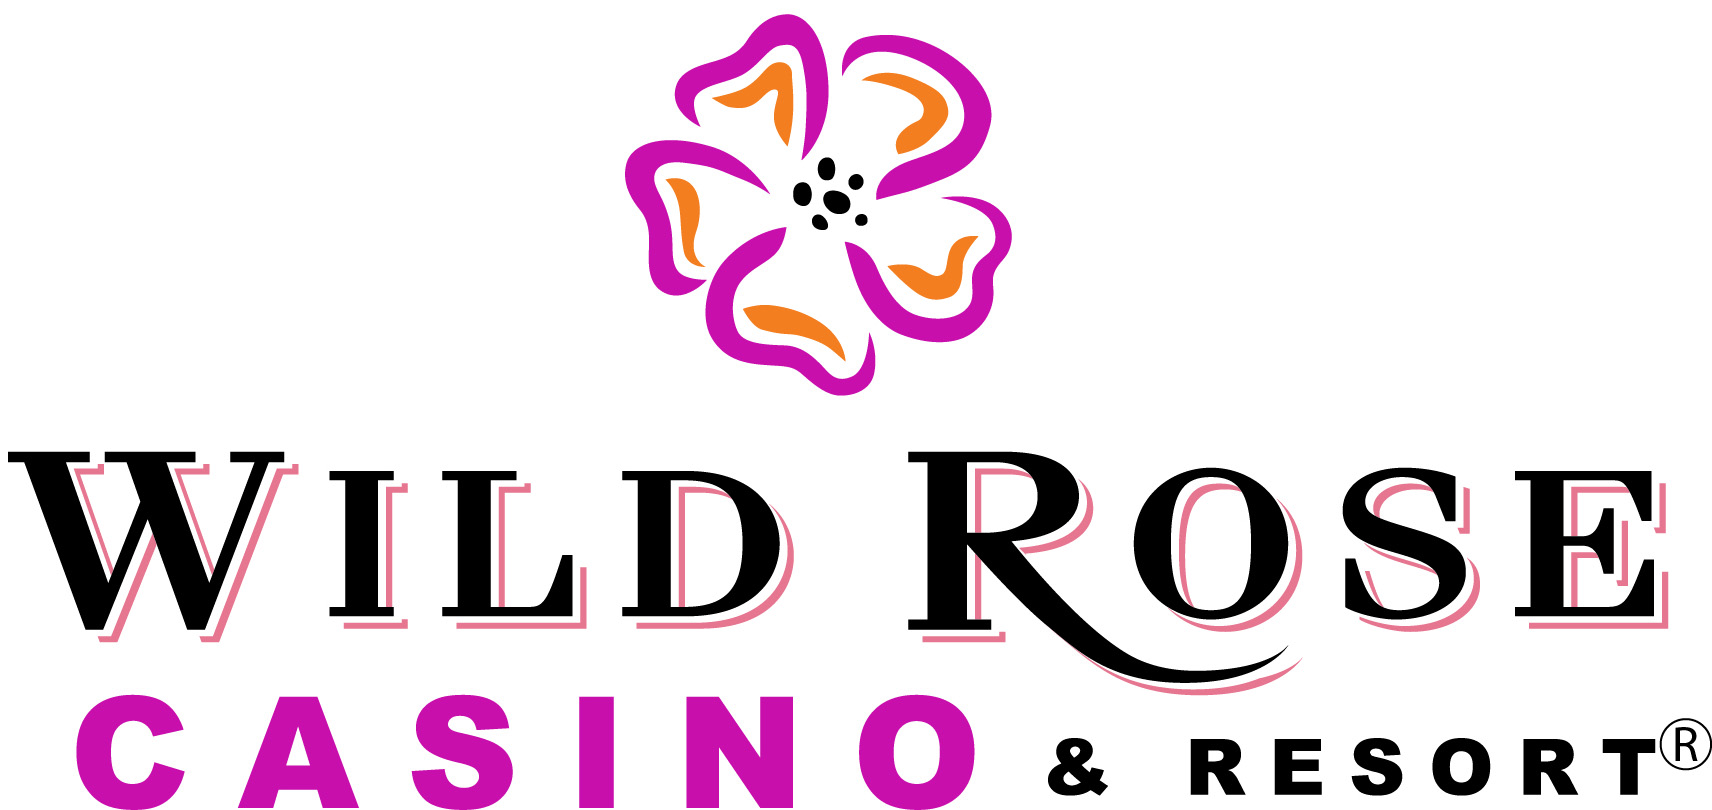 Wild rose casino iowa alladdin resort and casino